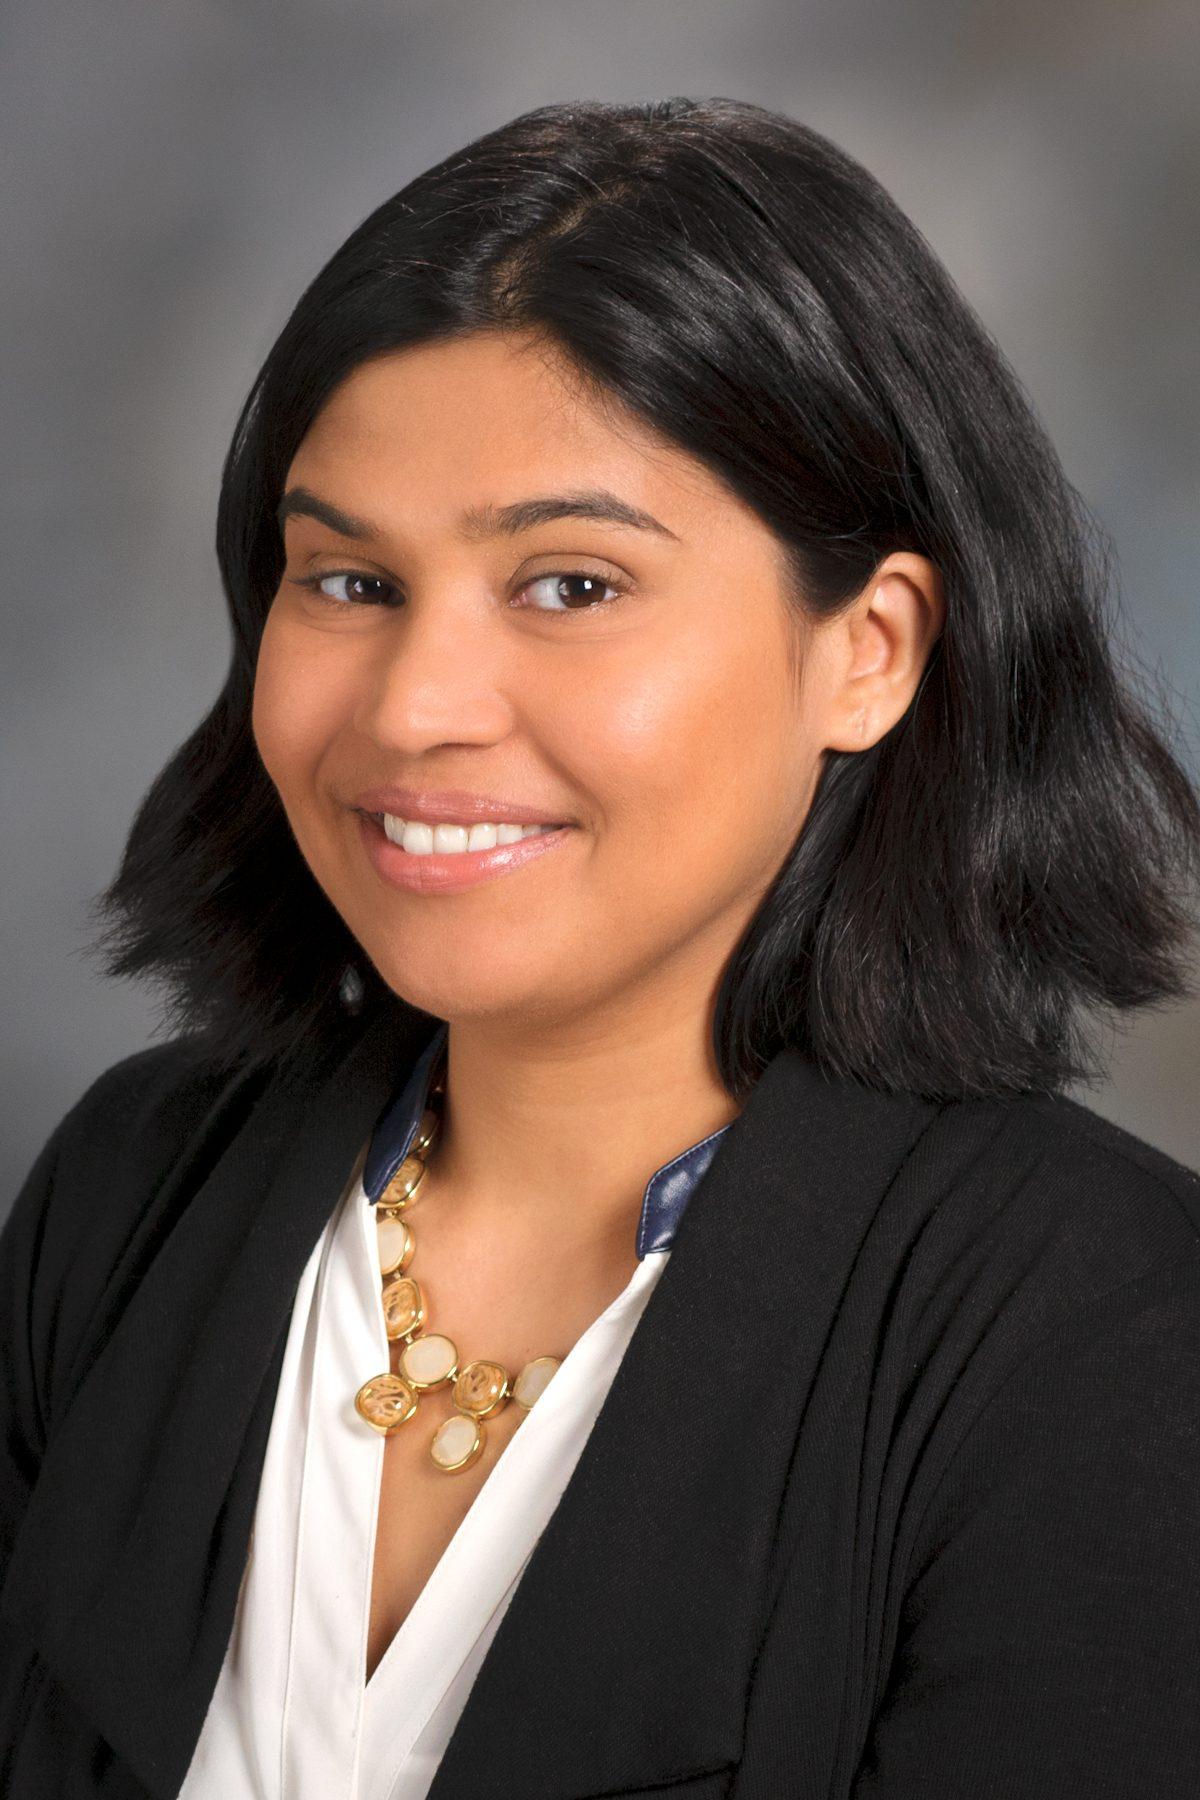 Priya Rao Md Anderson Cancer Center